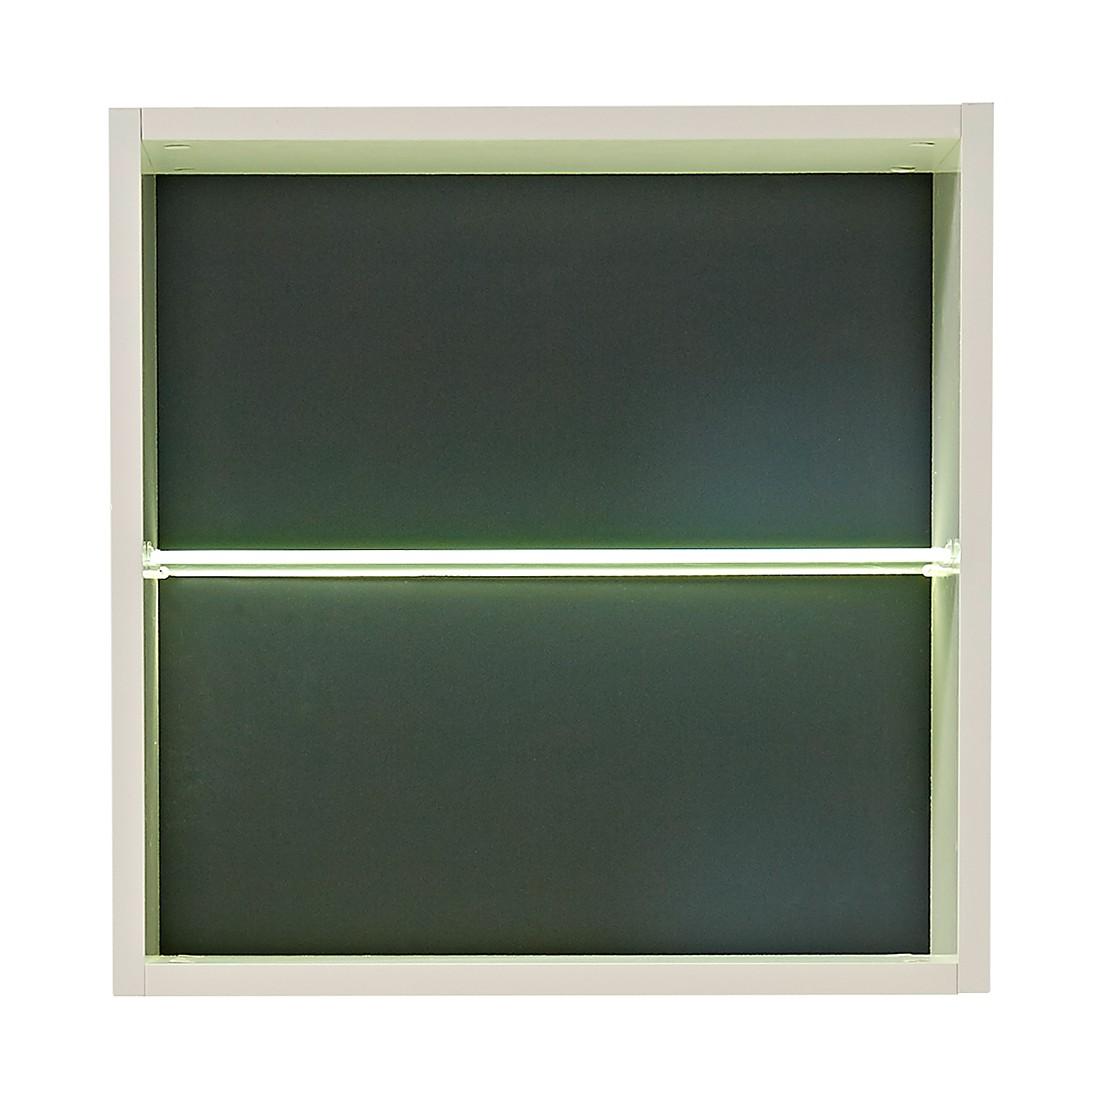 h ngeregal katakana mit beleuchtung raumteiler regal standregal wandregal. Black Bedroom Furniture Sets. Home Design Ideas